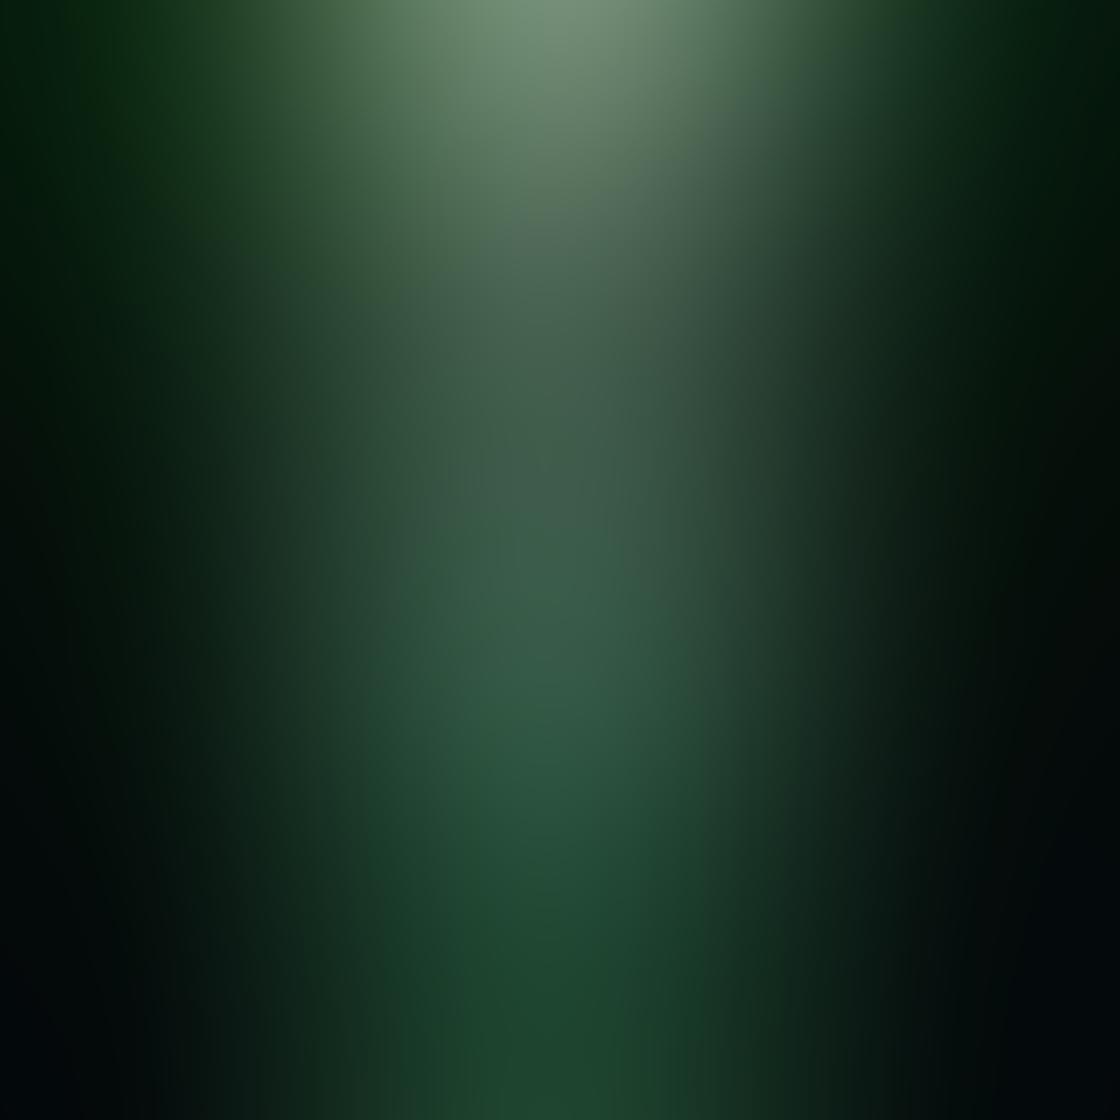 iPhone Silhouette Photos 22